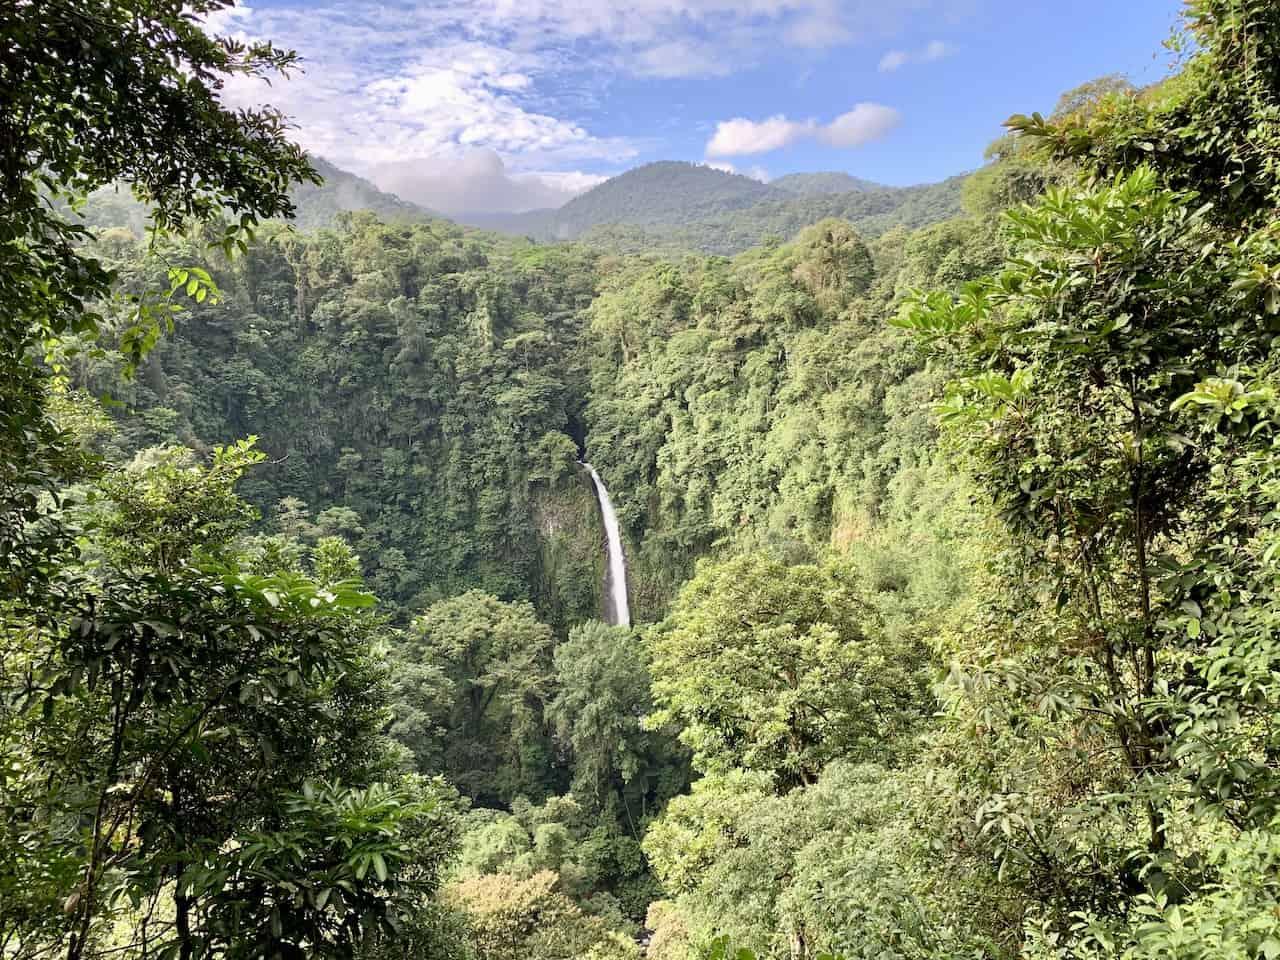 La Fortuna Waterfall Viewpoint